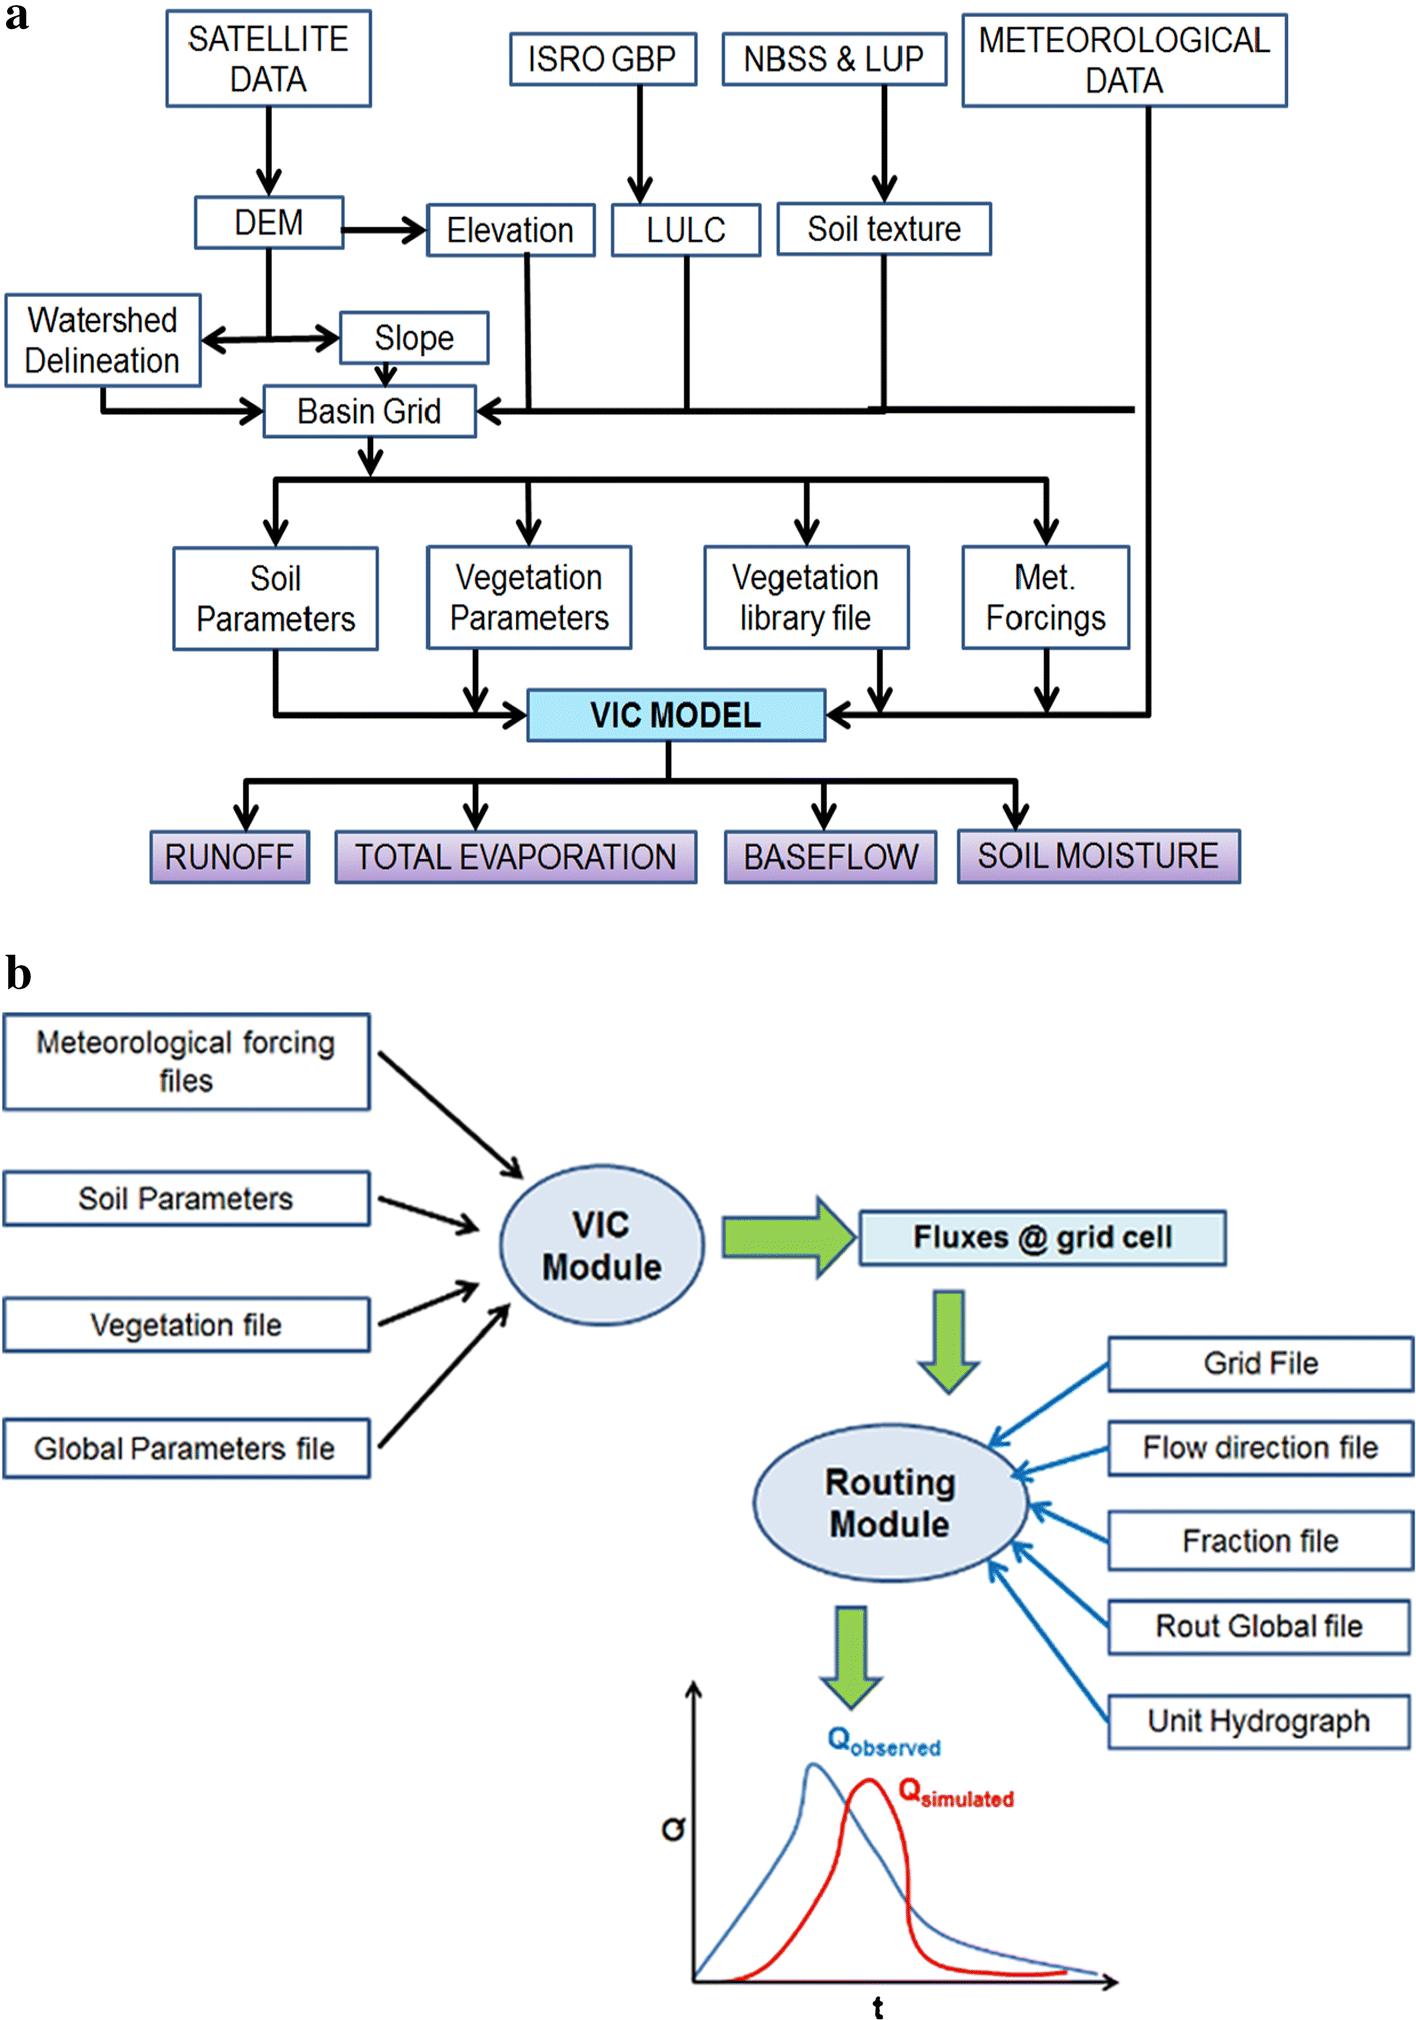 The Assimilation of Remote Sensing-Derived Soil Moisture